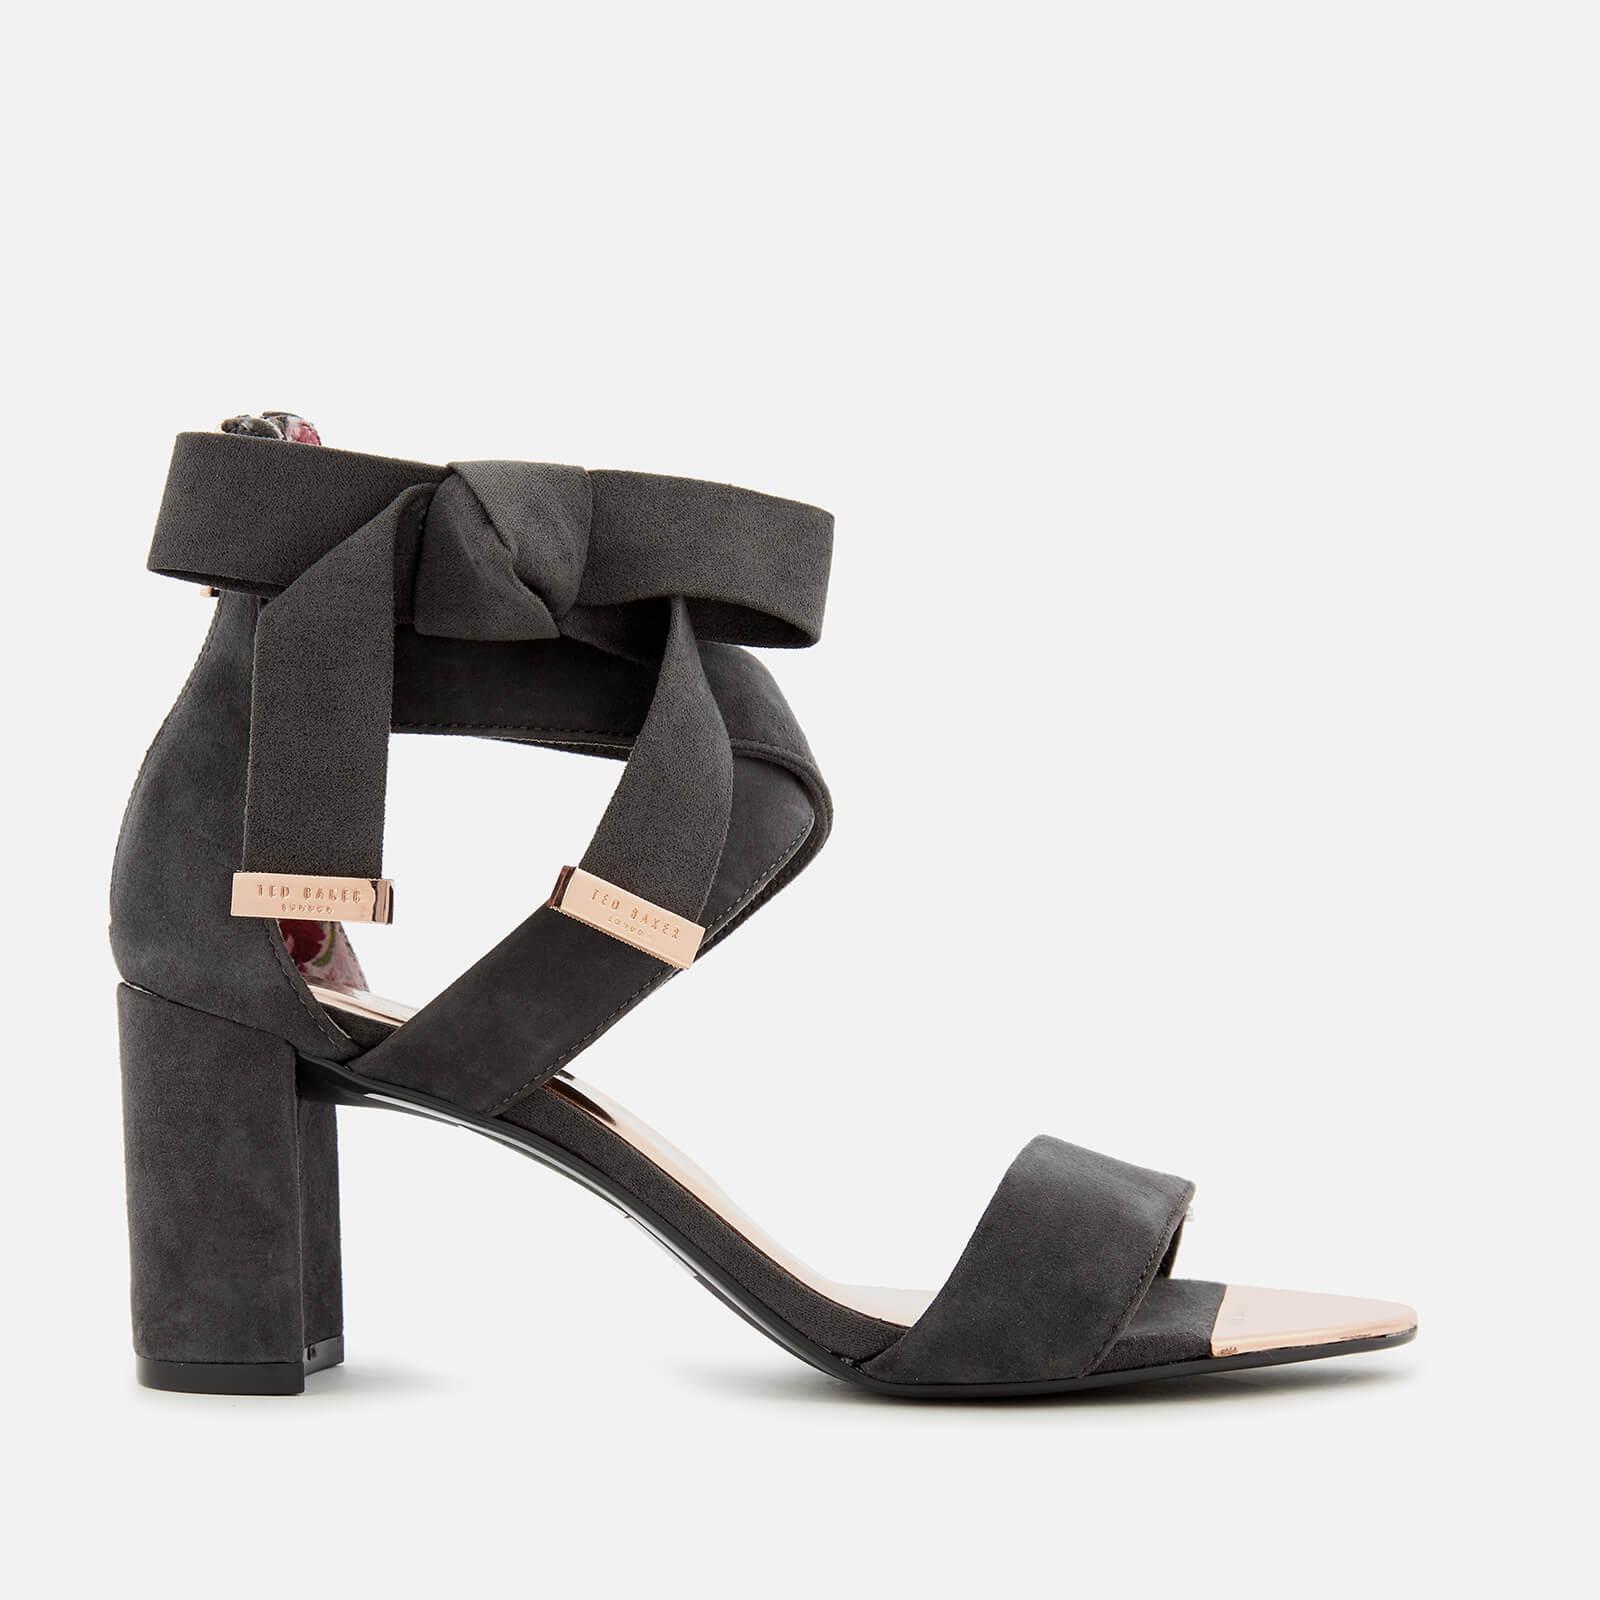 13664e7d40ccde Lyst - Ted Baker Noxen 2 Suede Block Heeled Sandals in Gray